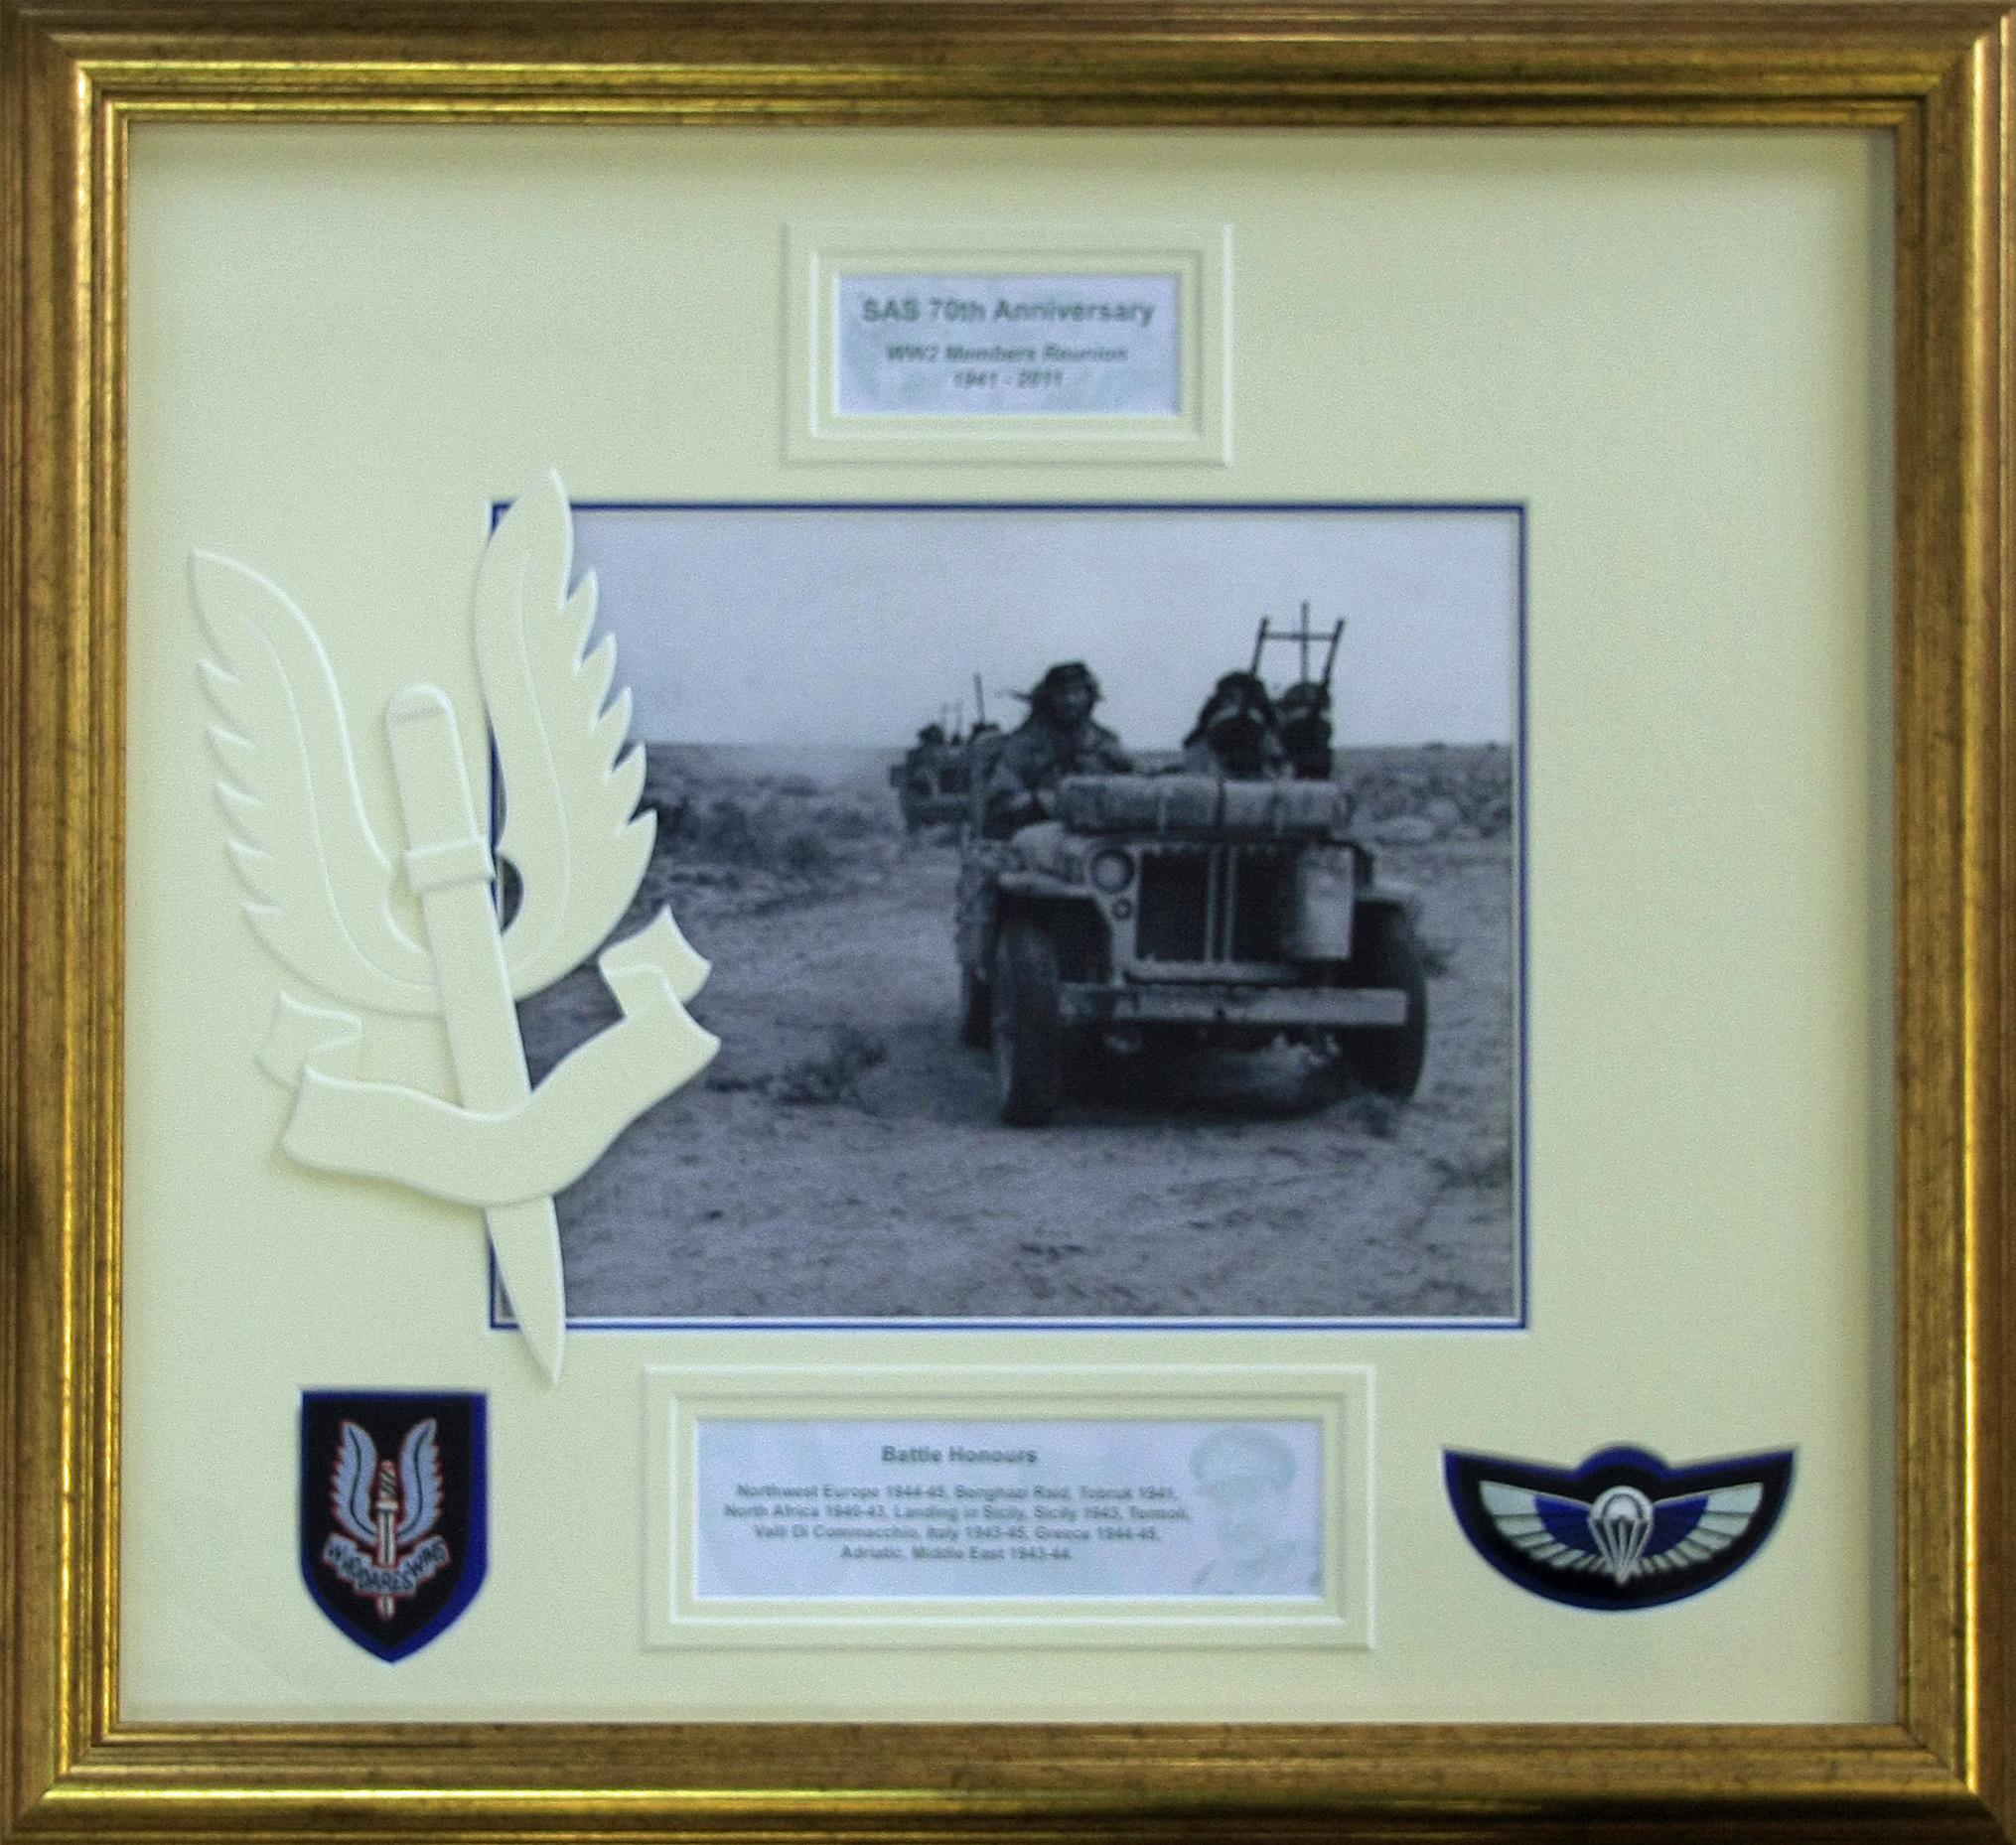 SAS 70th Anniversary Presentation.